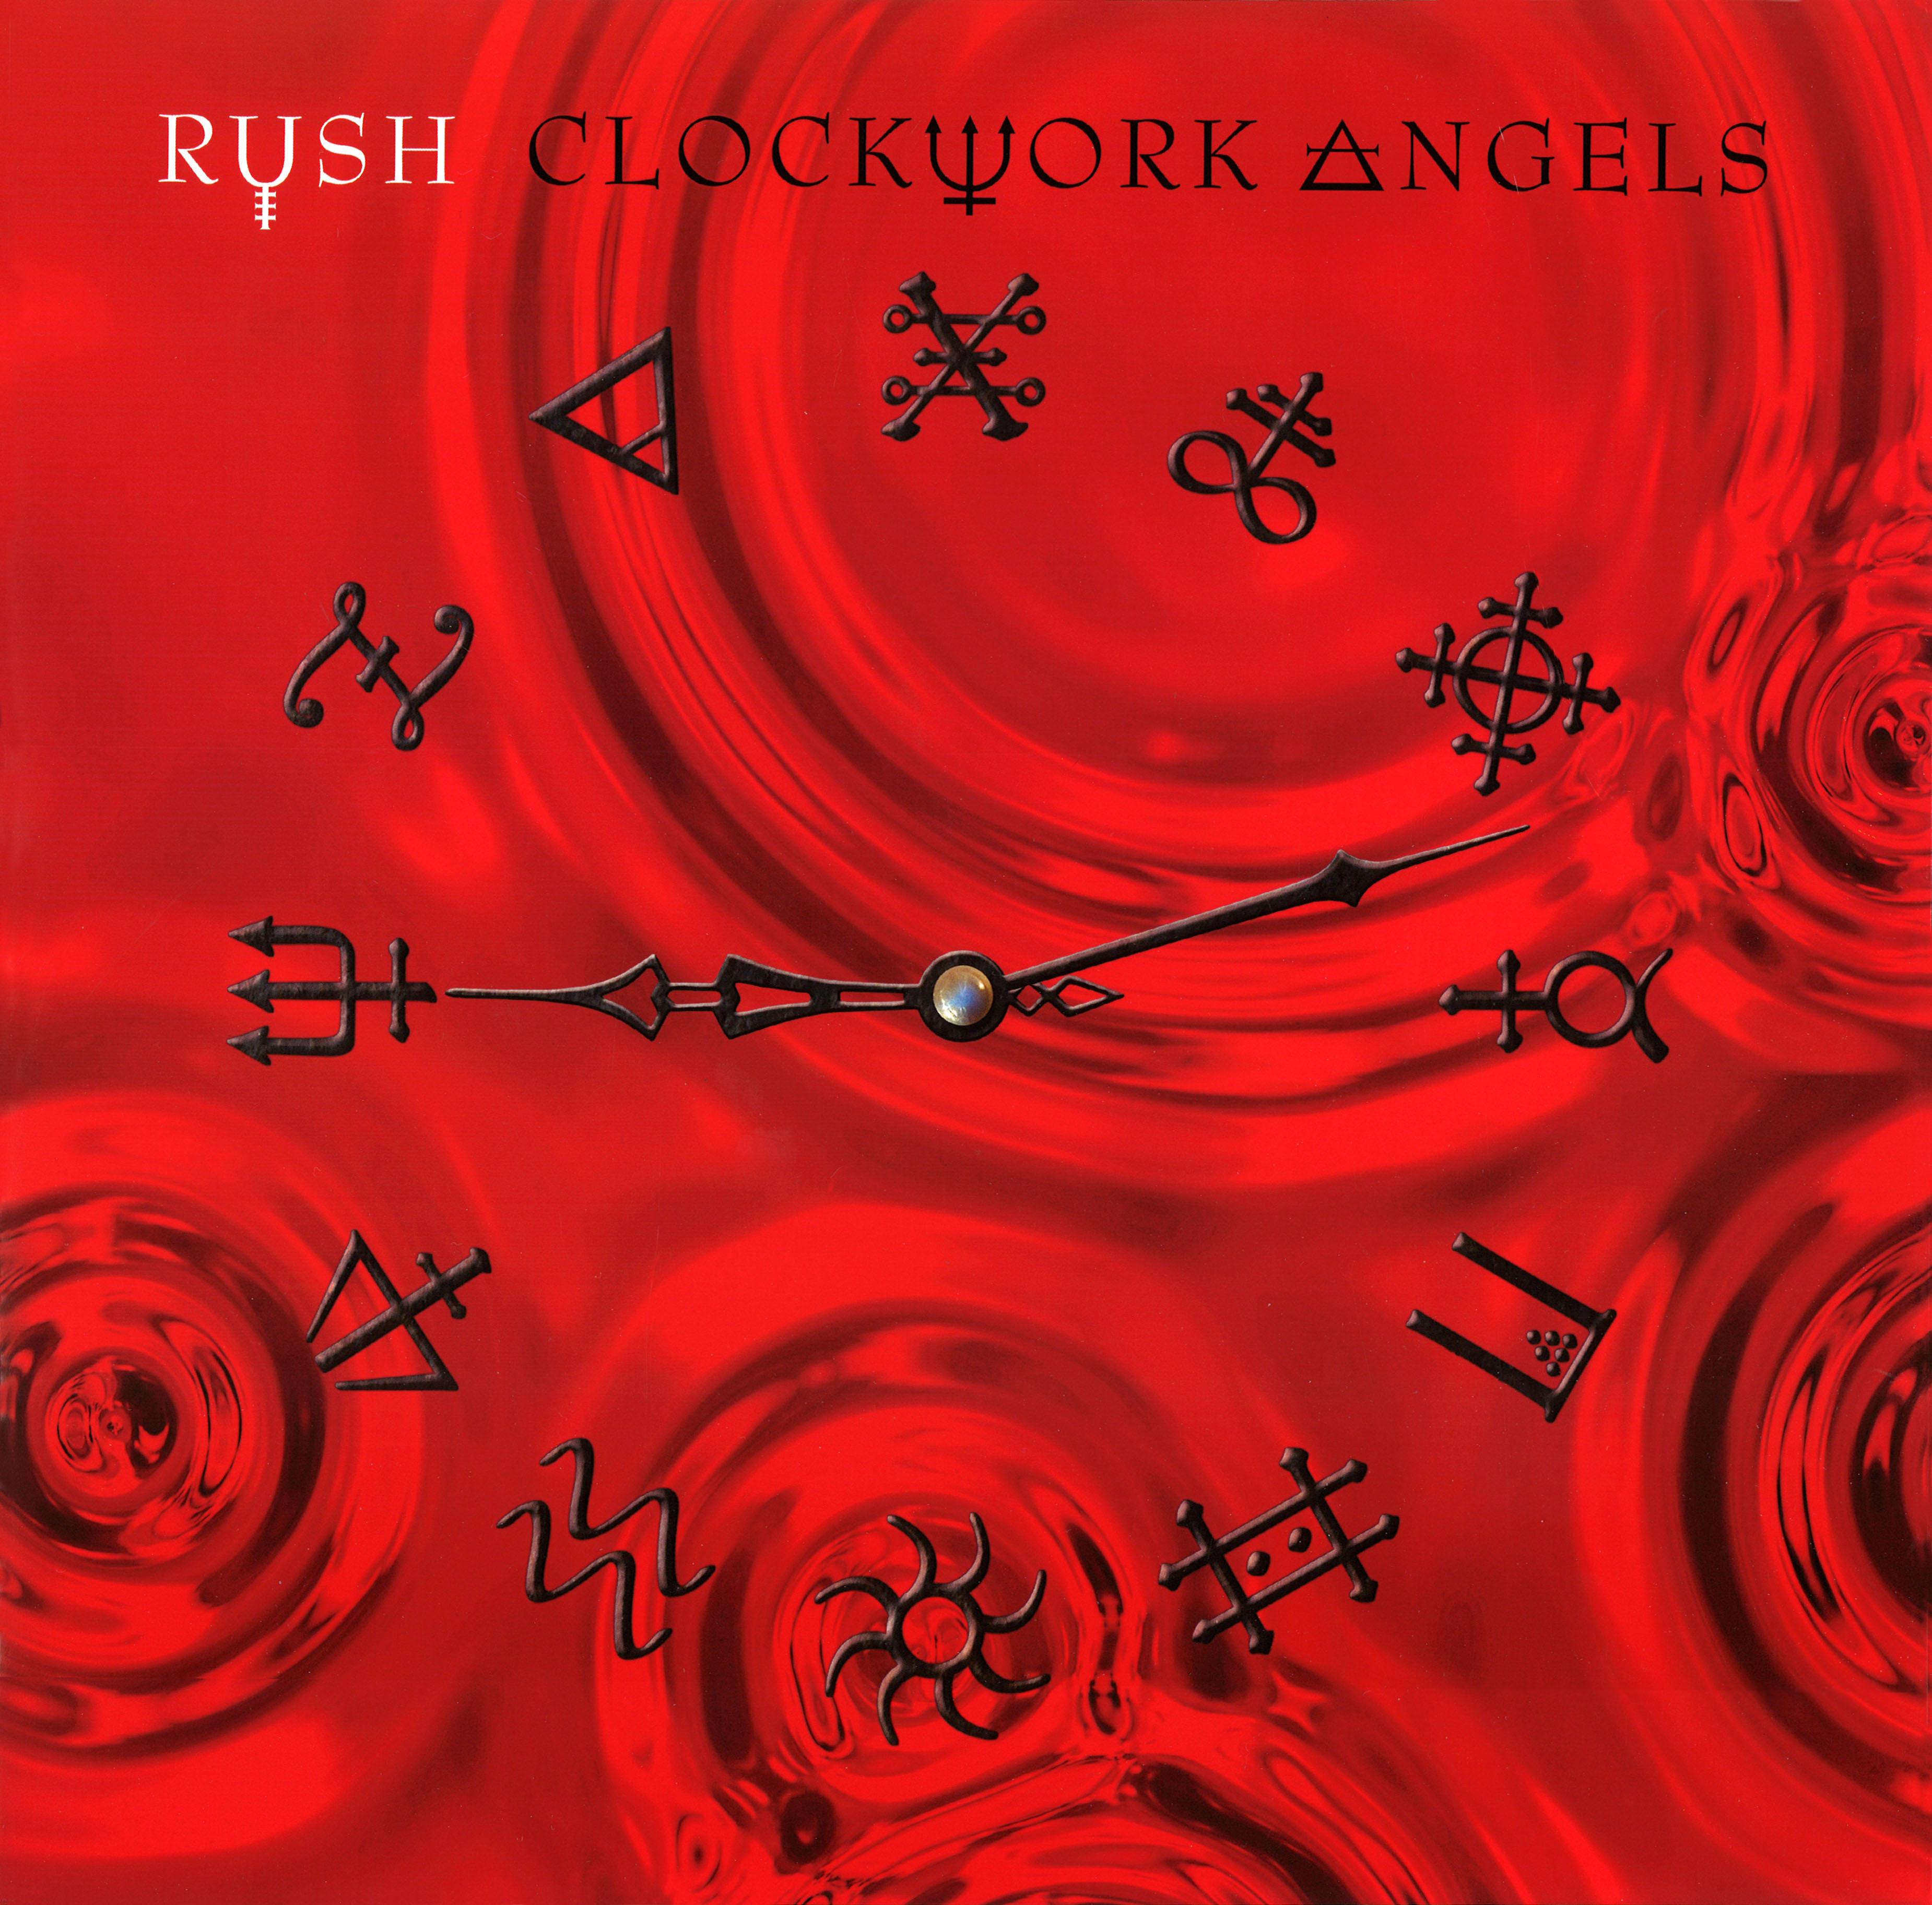 Clockwork Angels By Rush [Album Review]   Rush Clockwork Angels Graphics